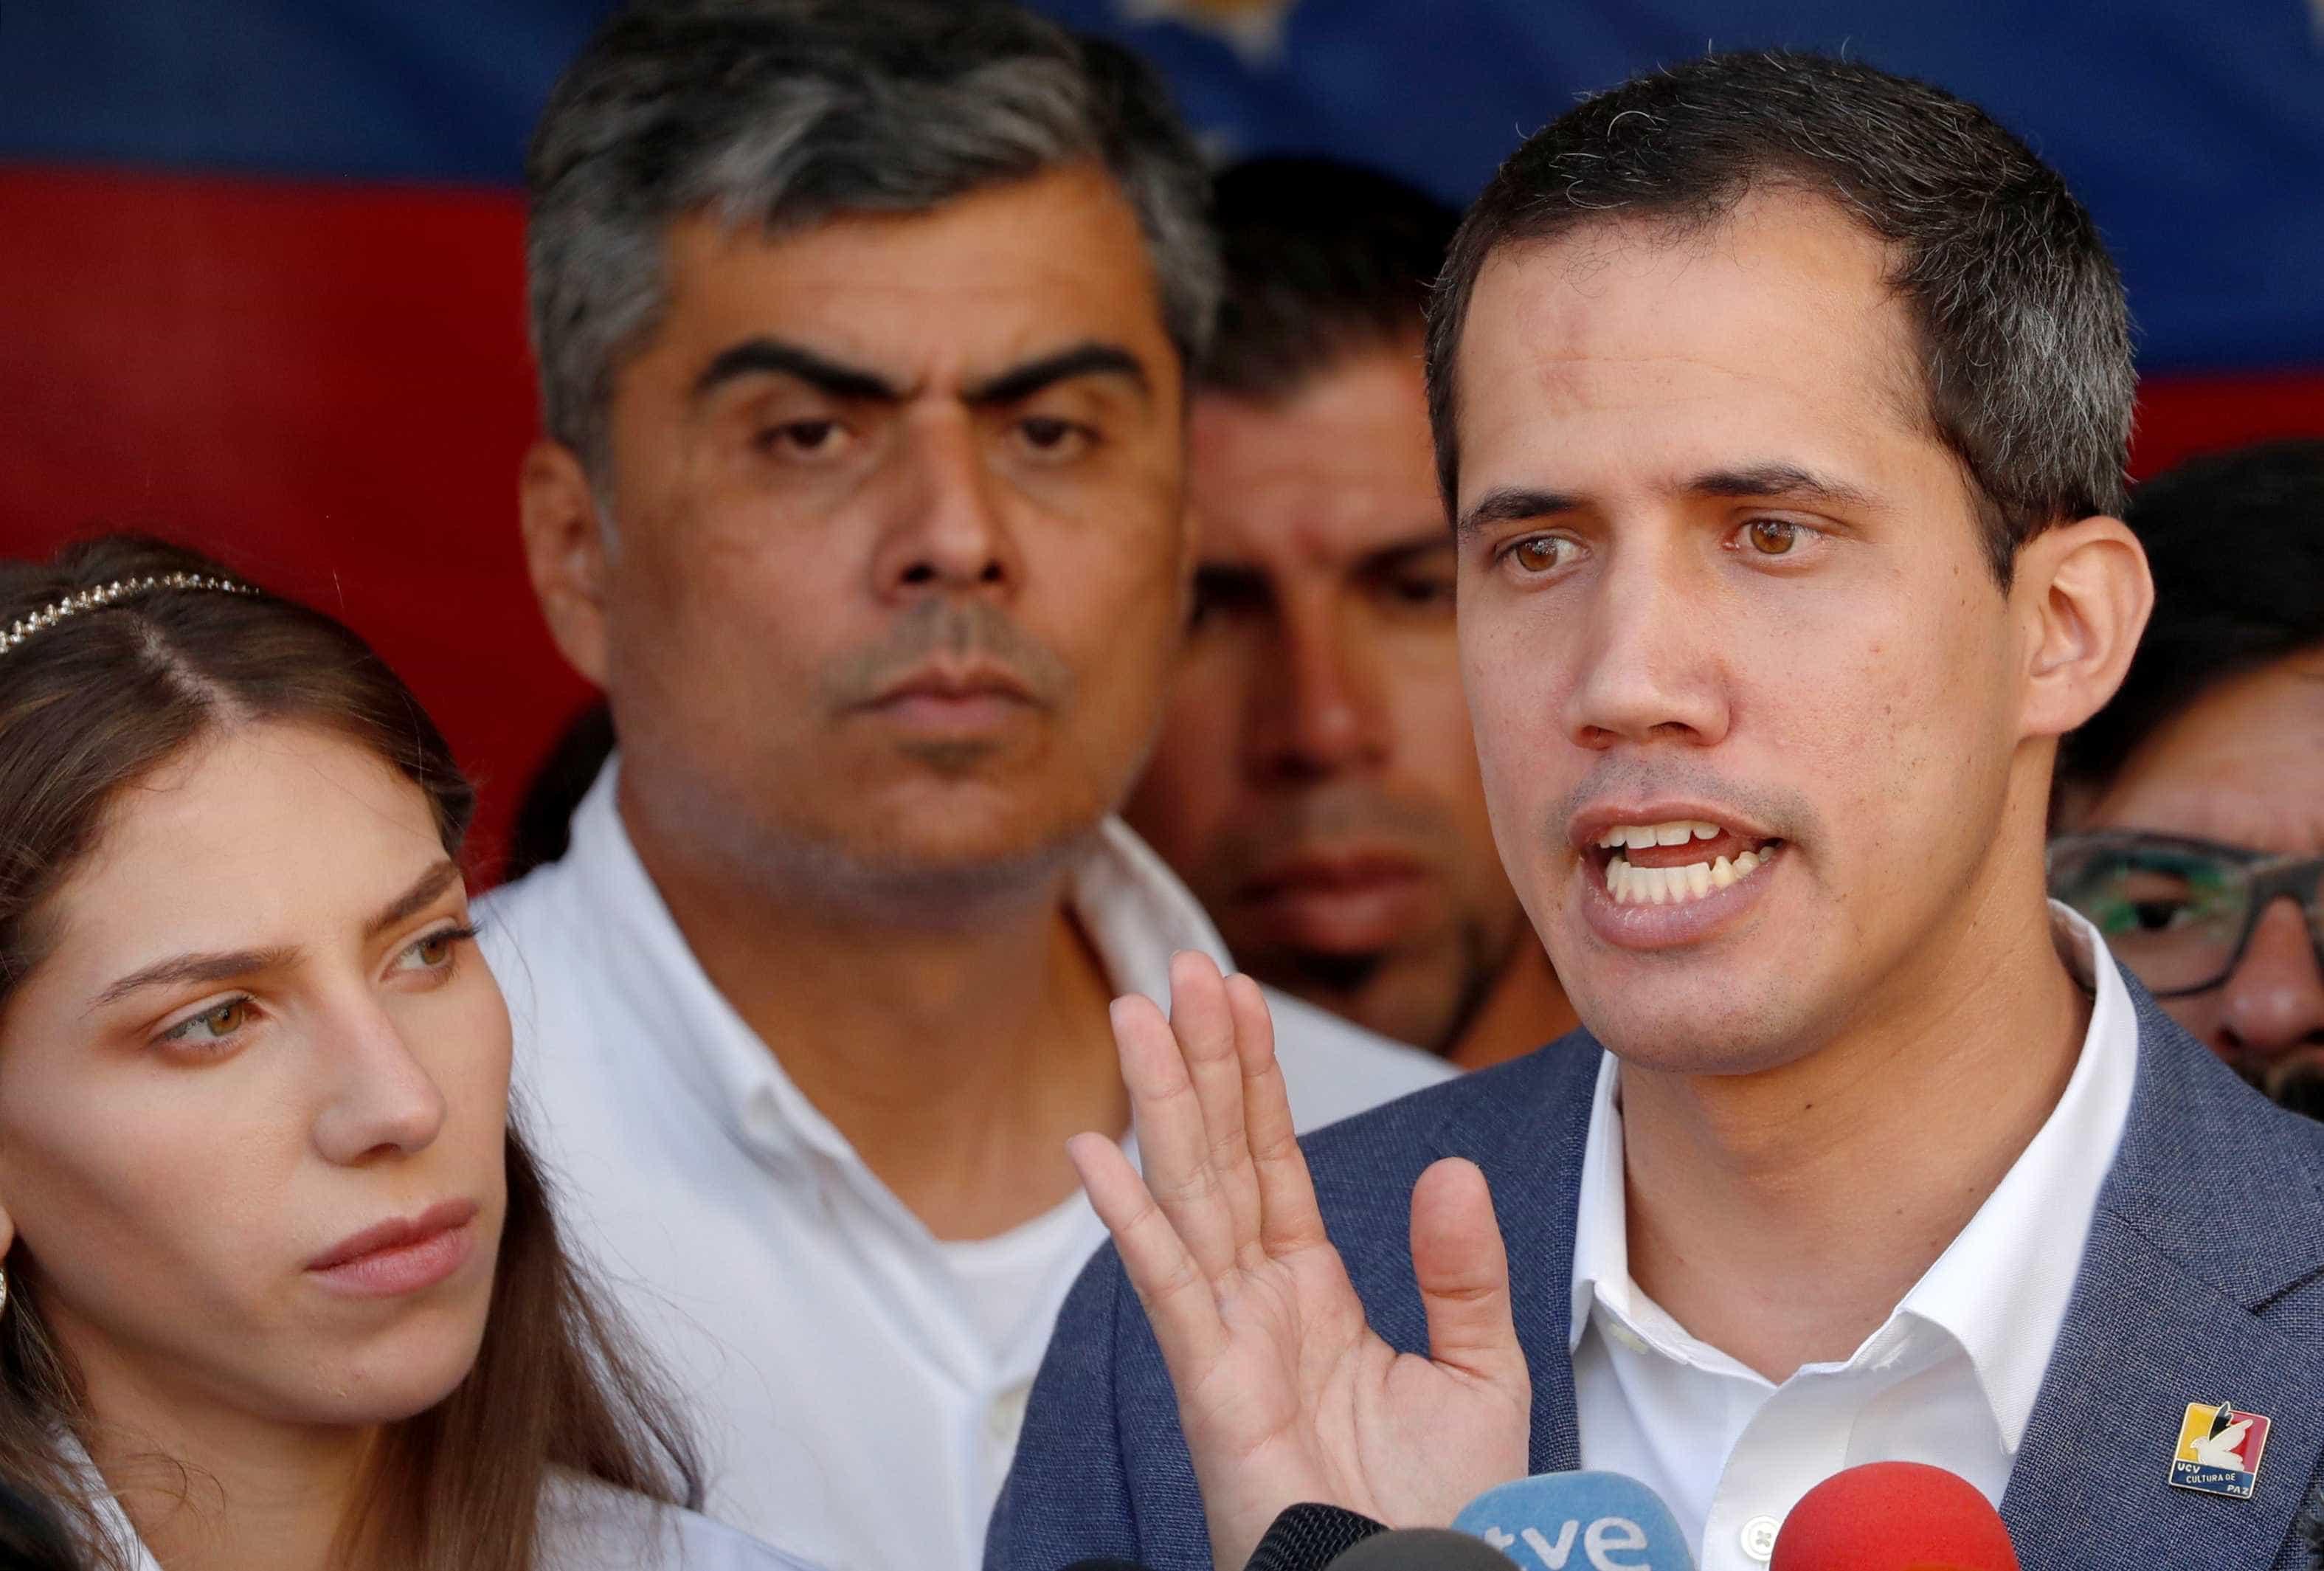 Delegação de Juan Guaidó é recebida no Vaticano